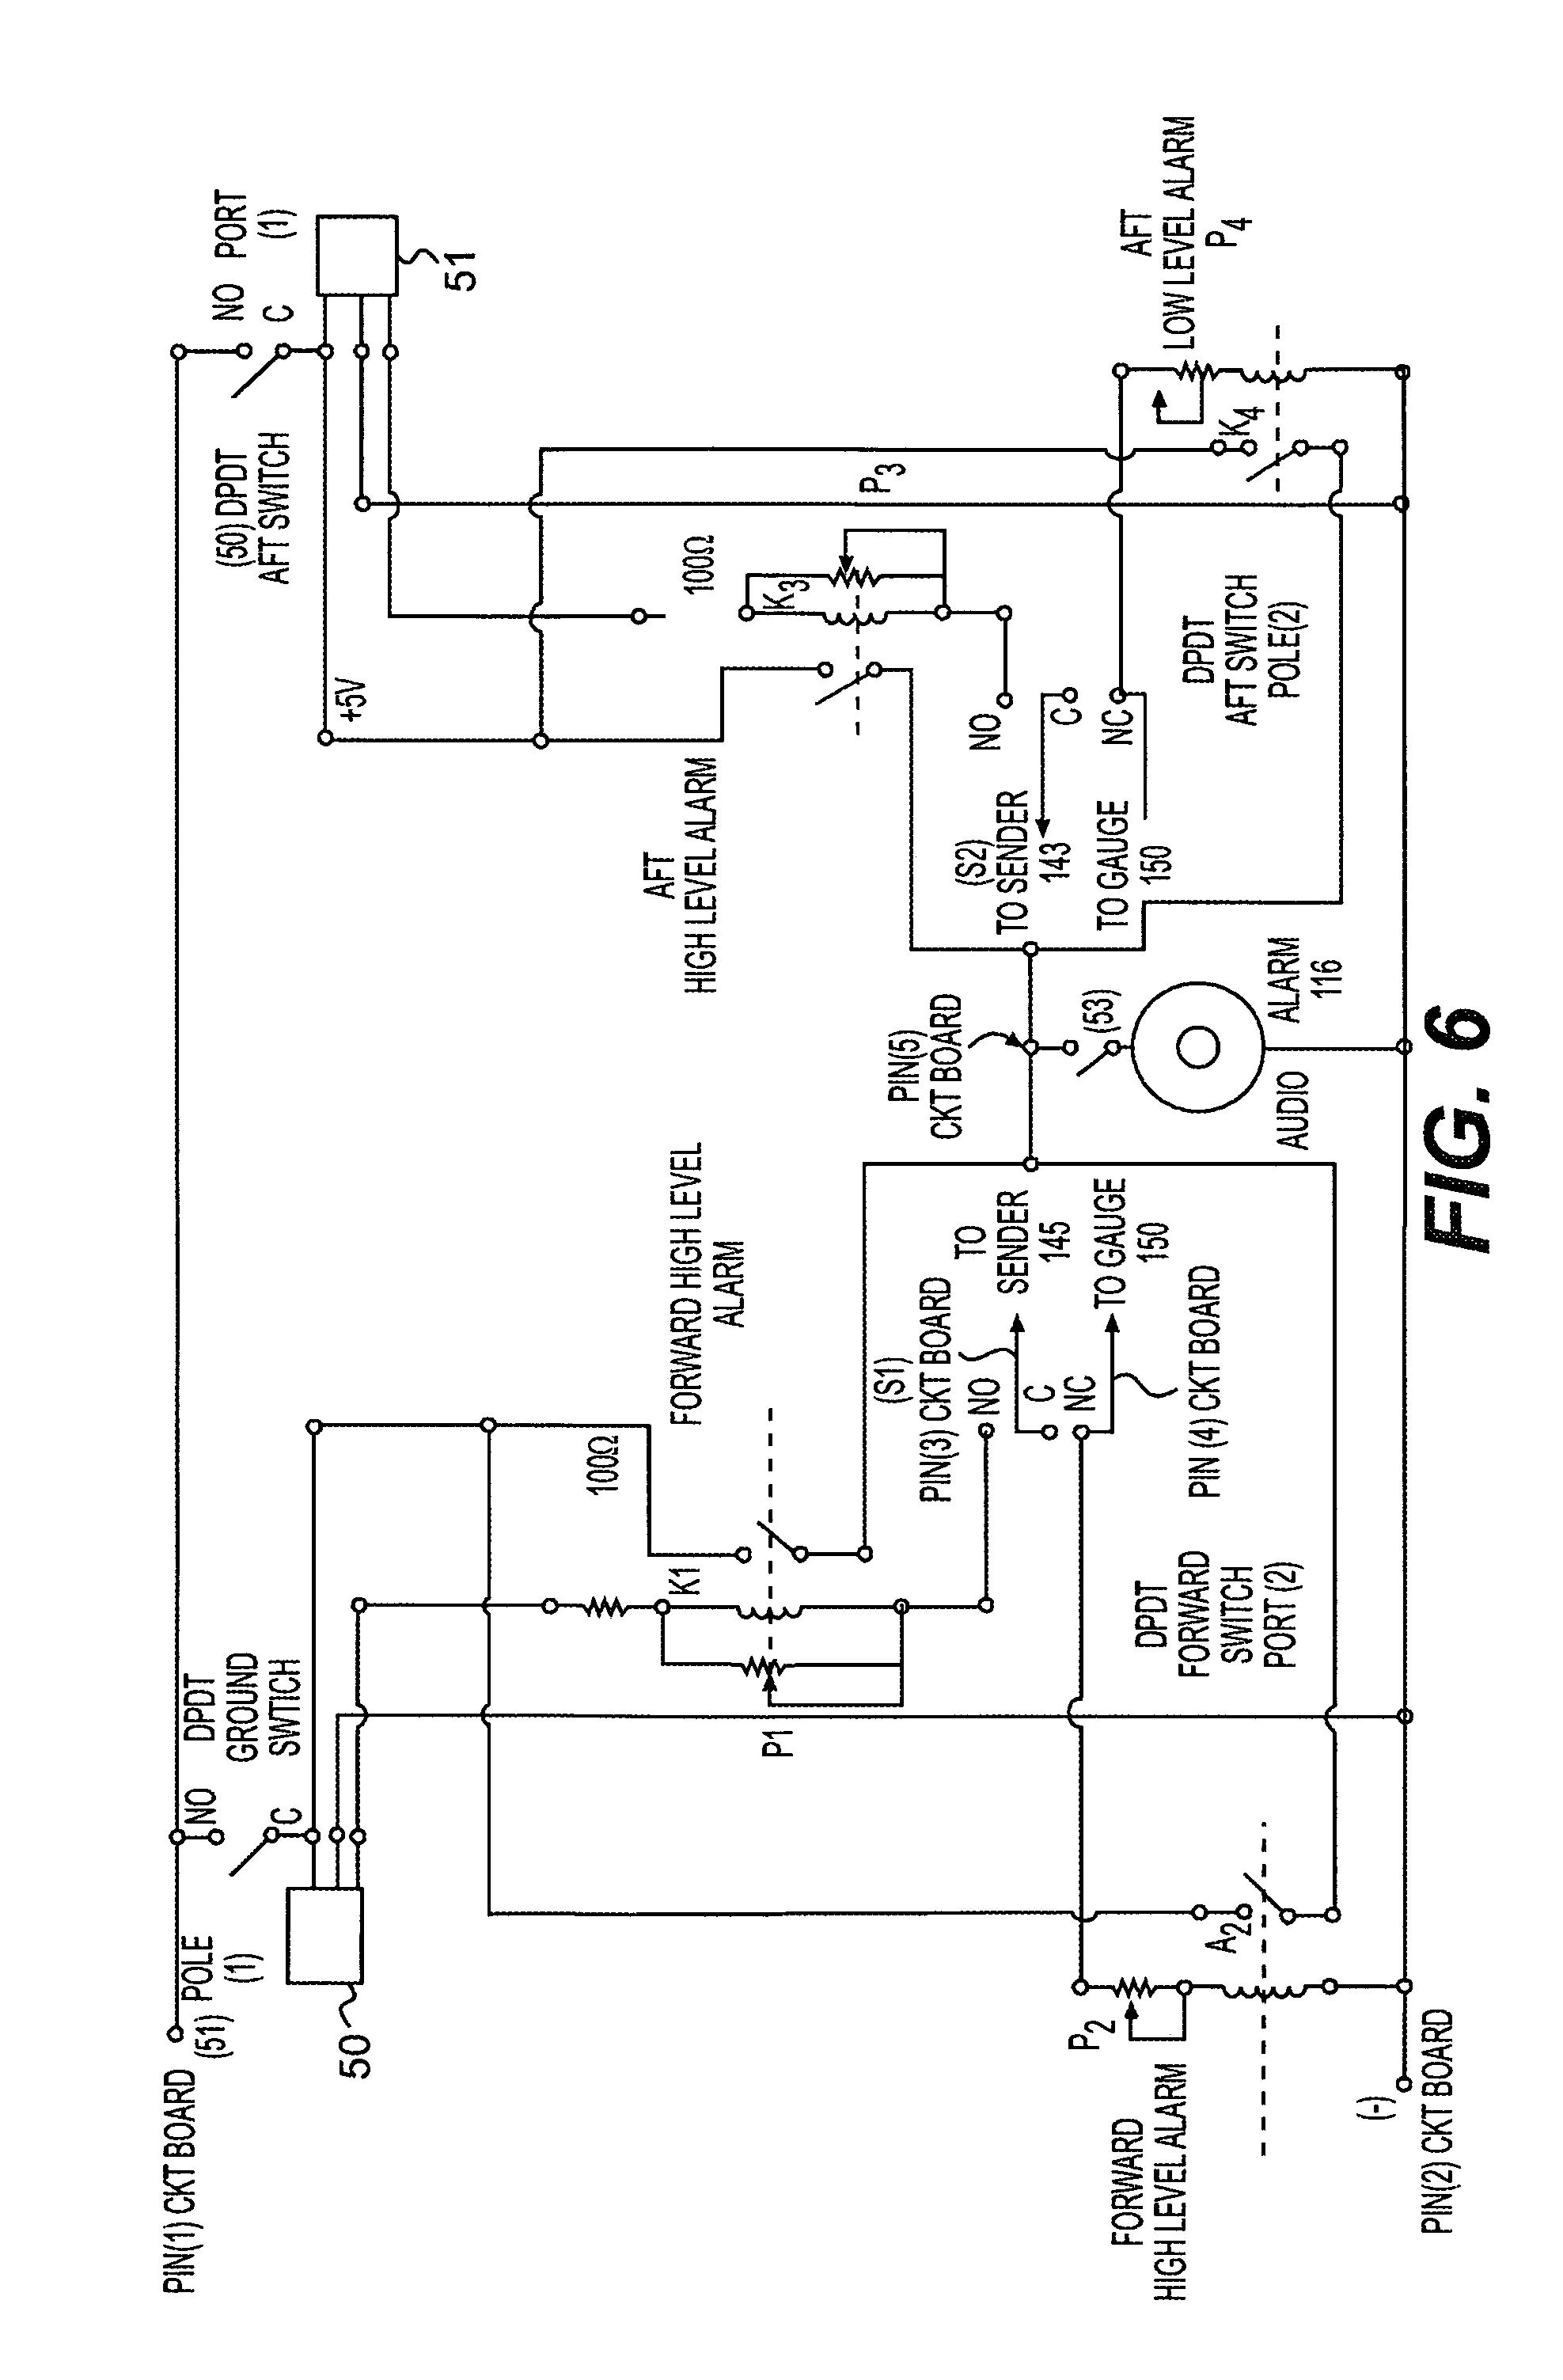 fleetwood motorhome battery wiring diagram